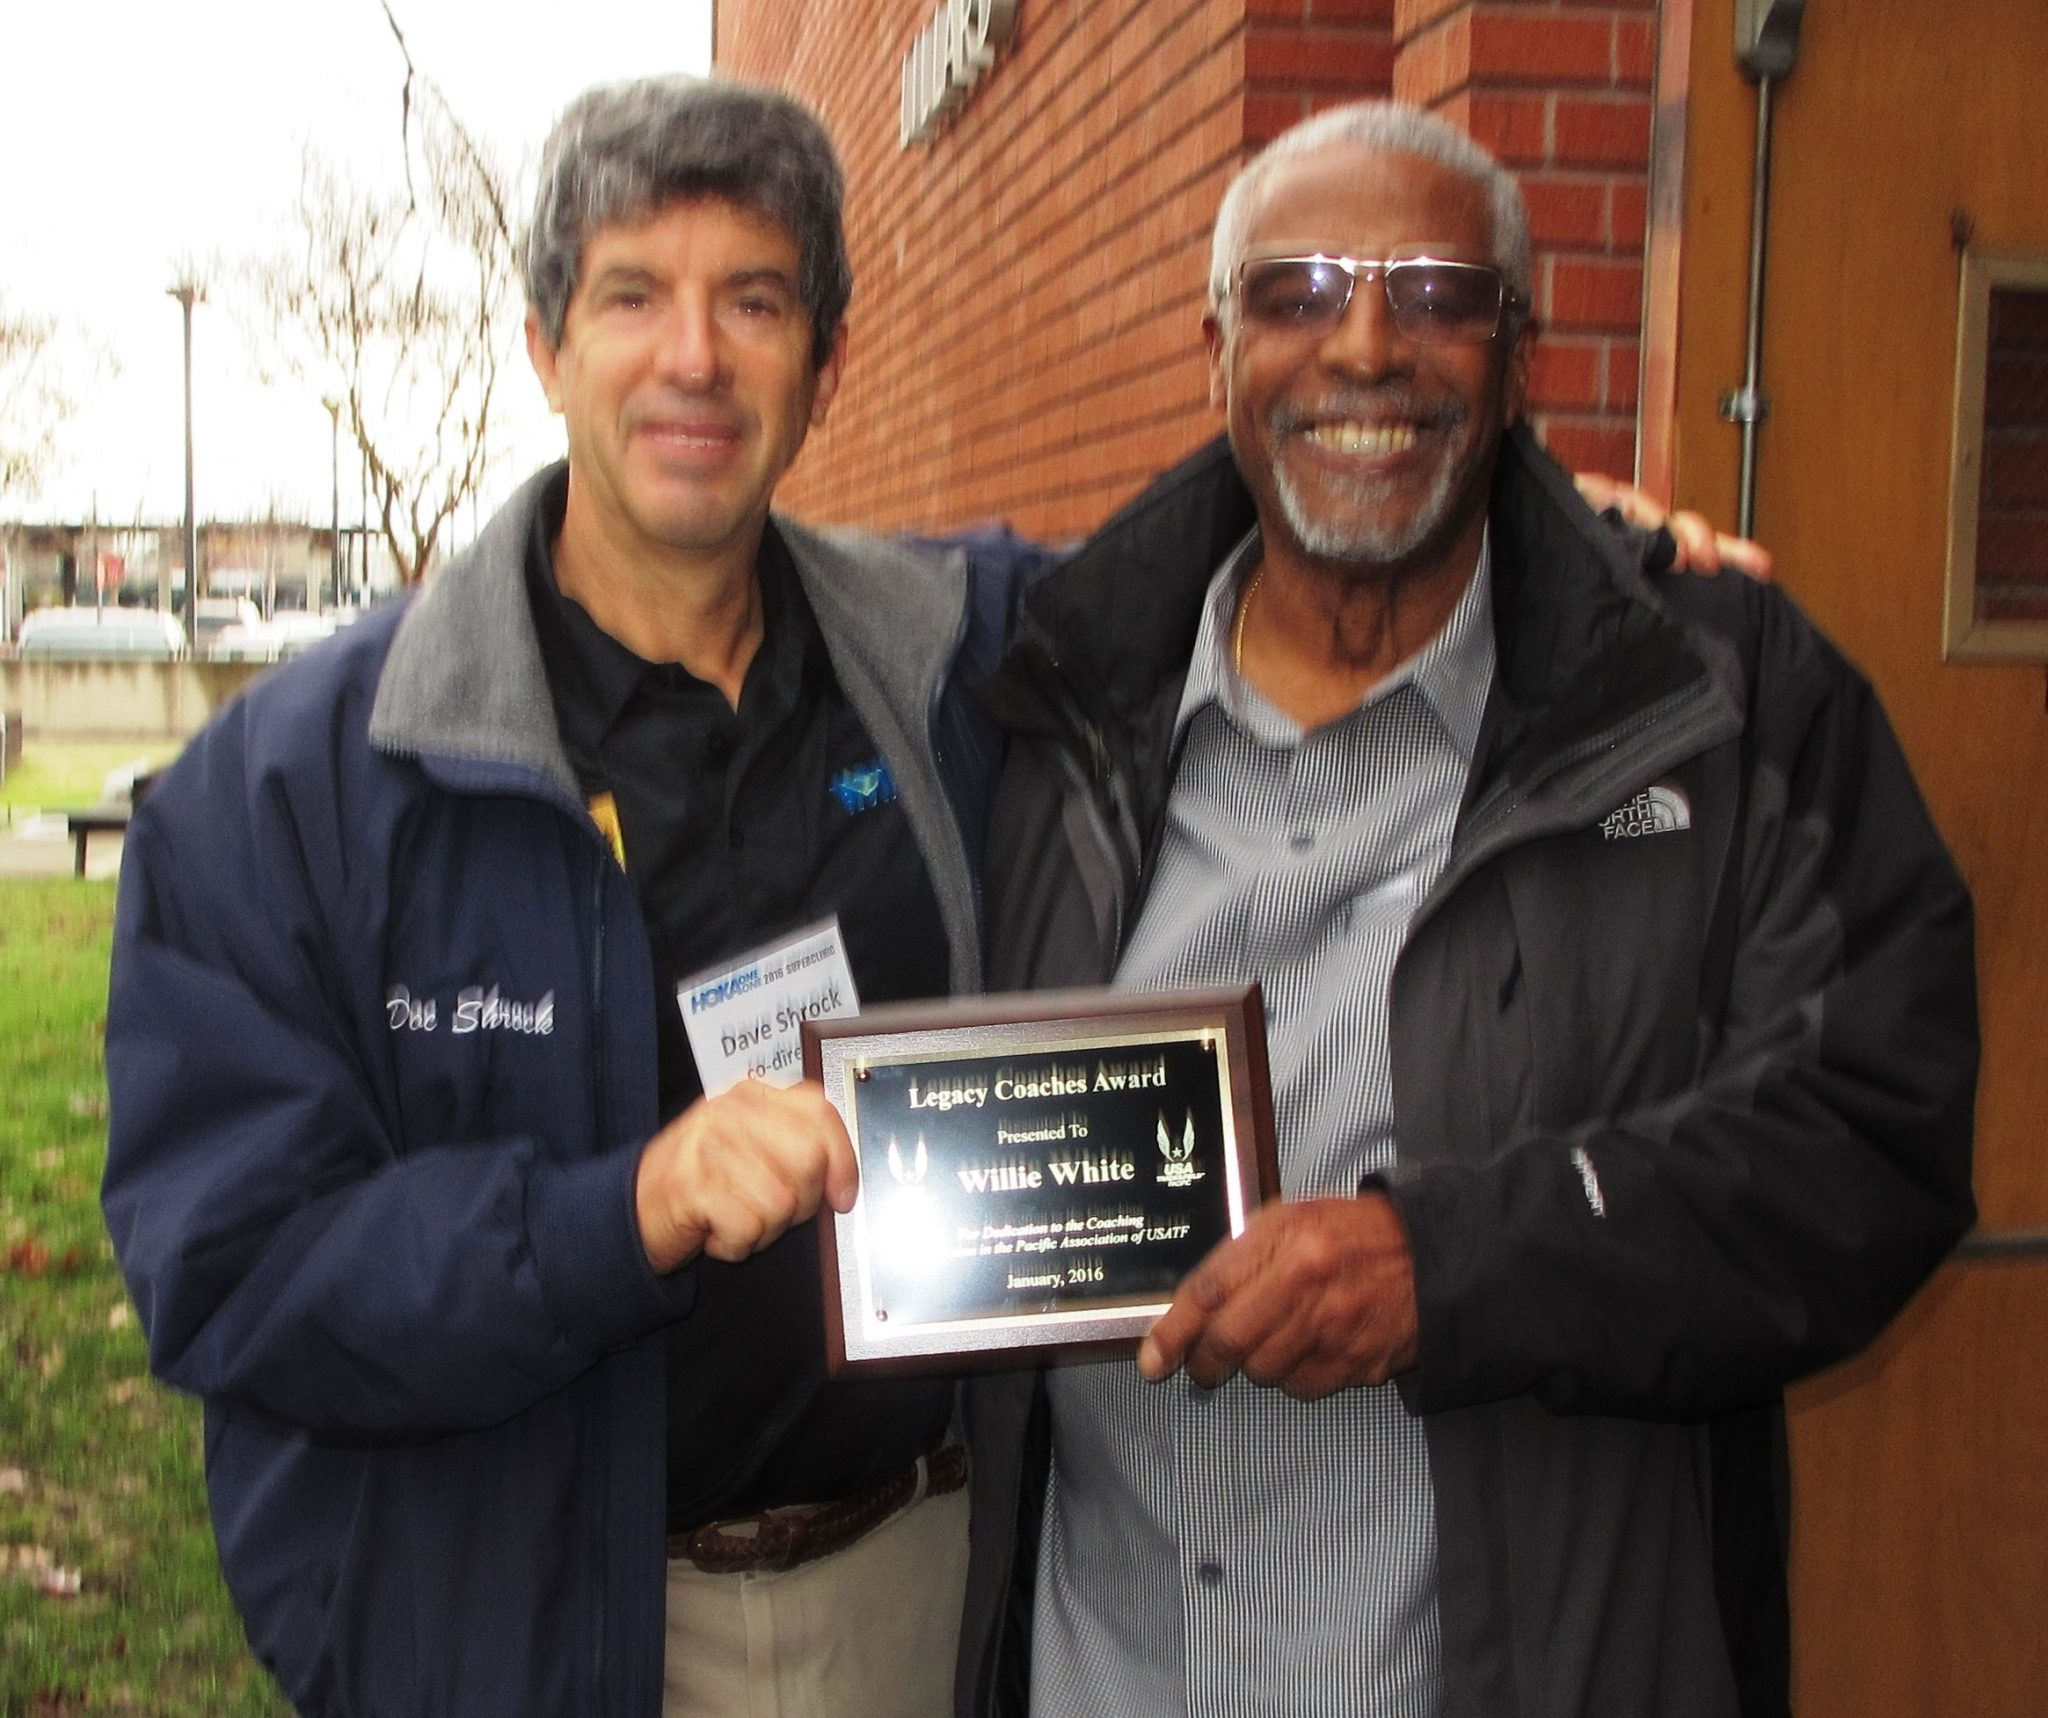 2015 Legacy Coach Award recipient Willie White